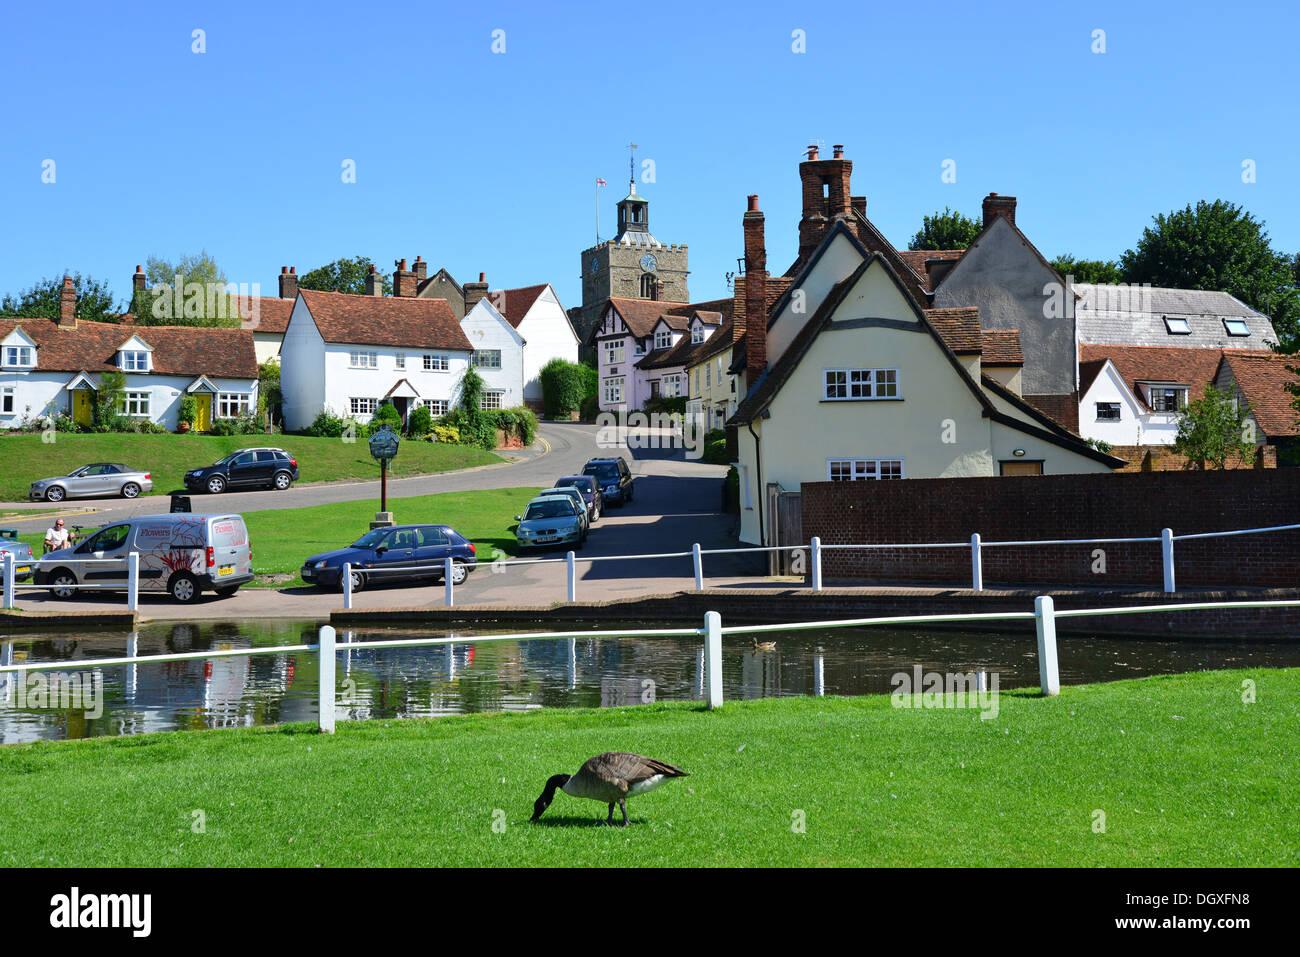 Essex United Kingdom  City pictures : Village Green And Pond, Finchingfield, Essex, England, United Kingdom ...